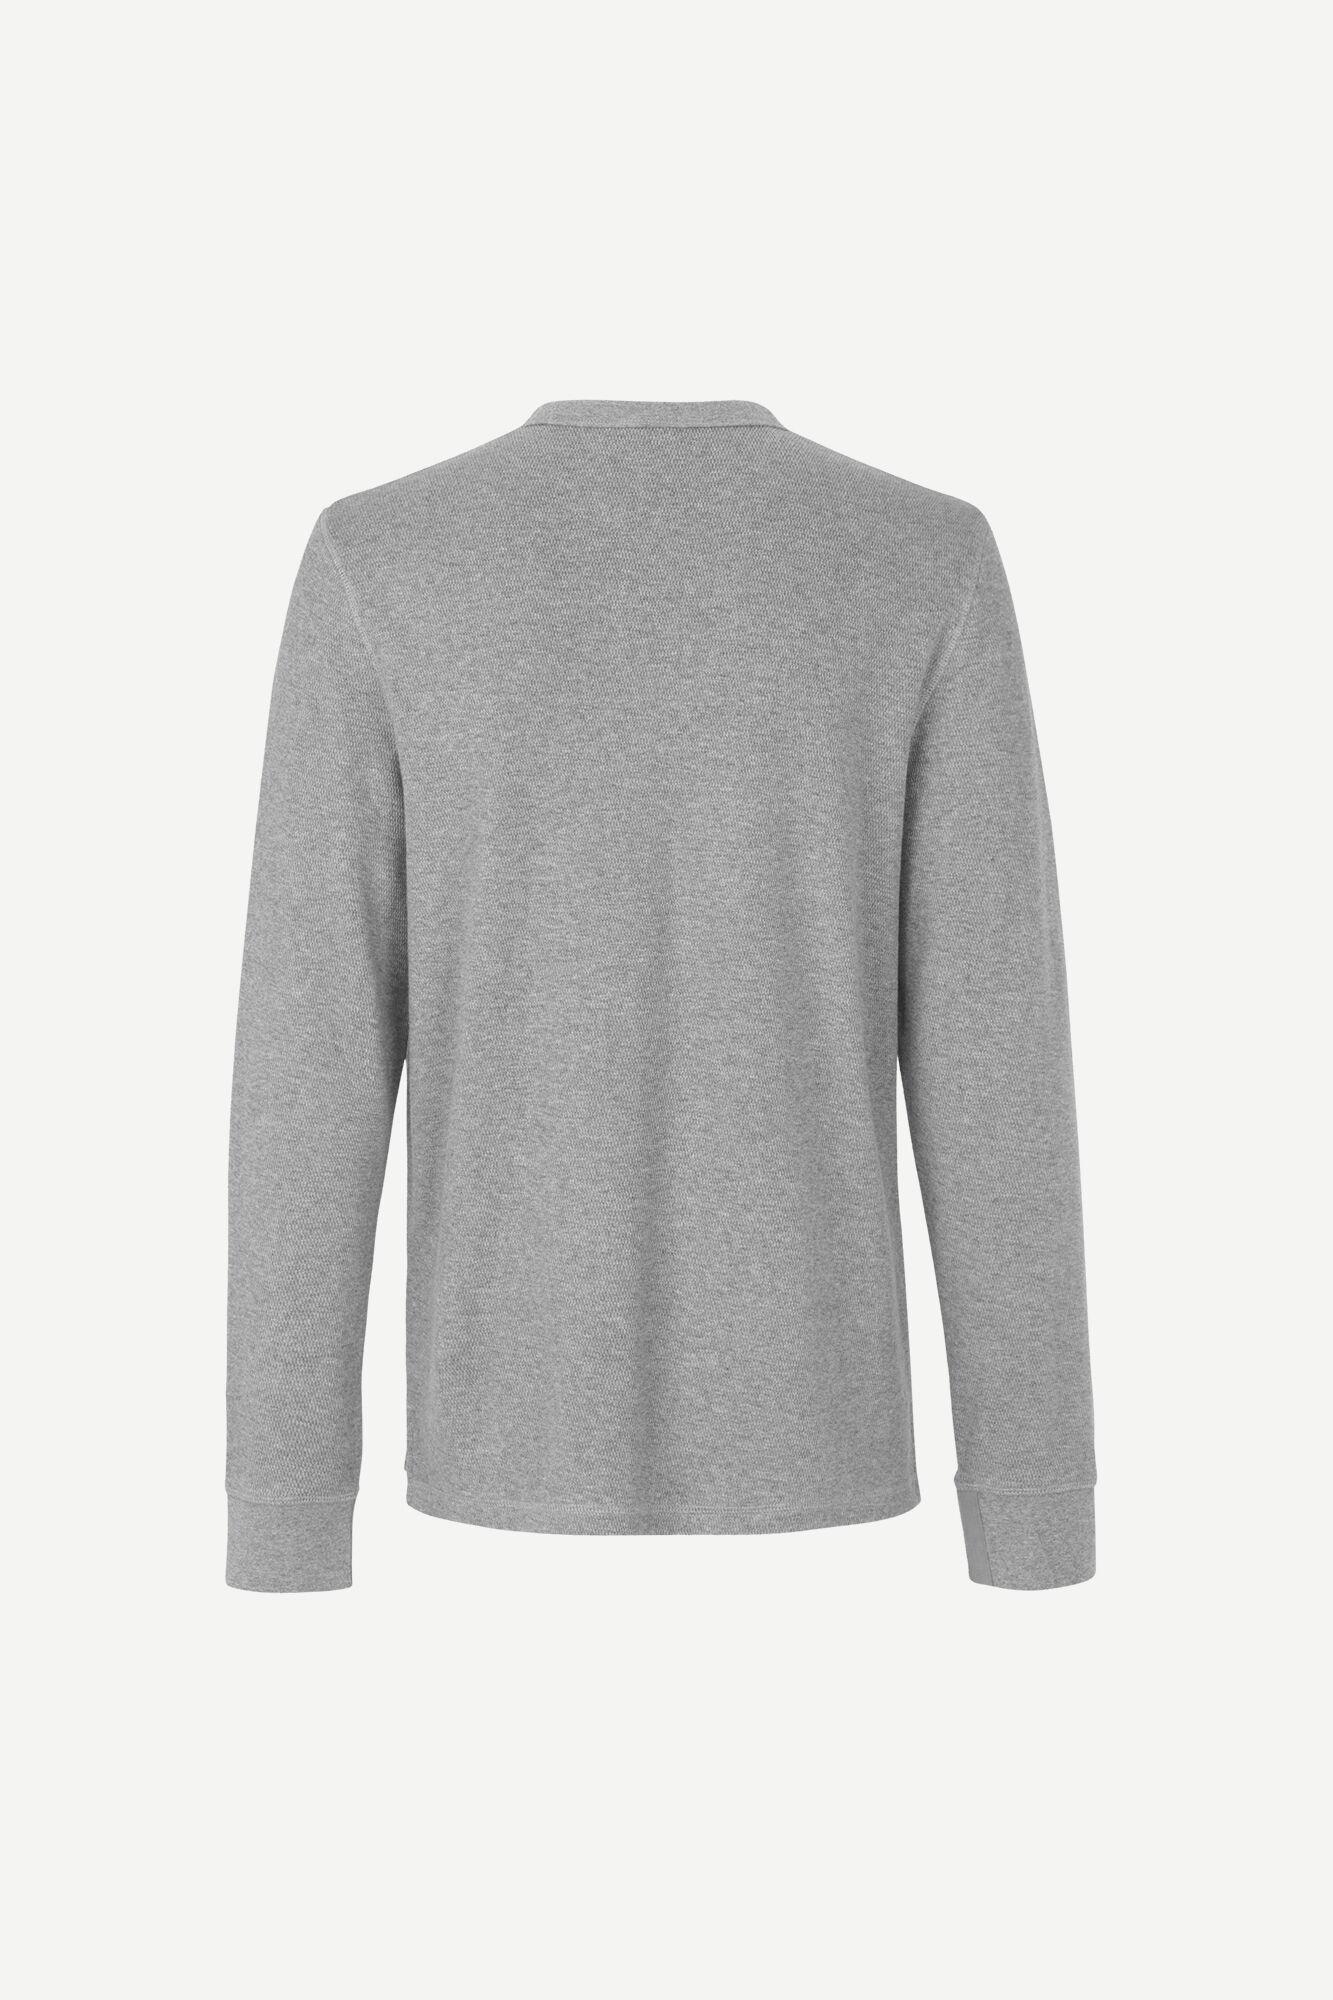 Stavso t-shirt ls 11569, GREY MEL.